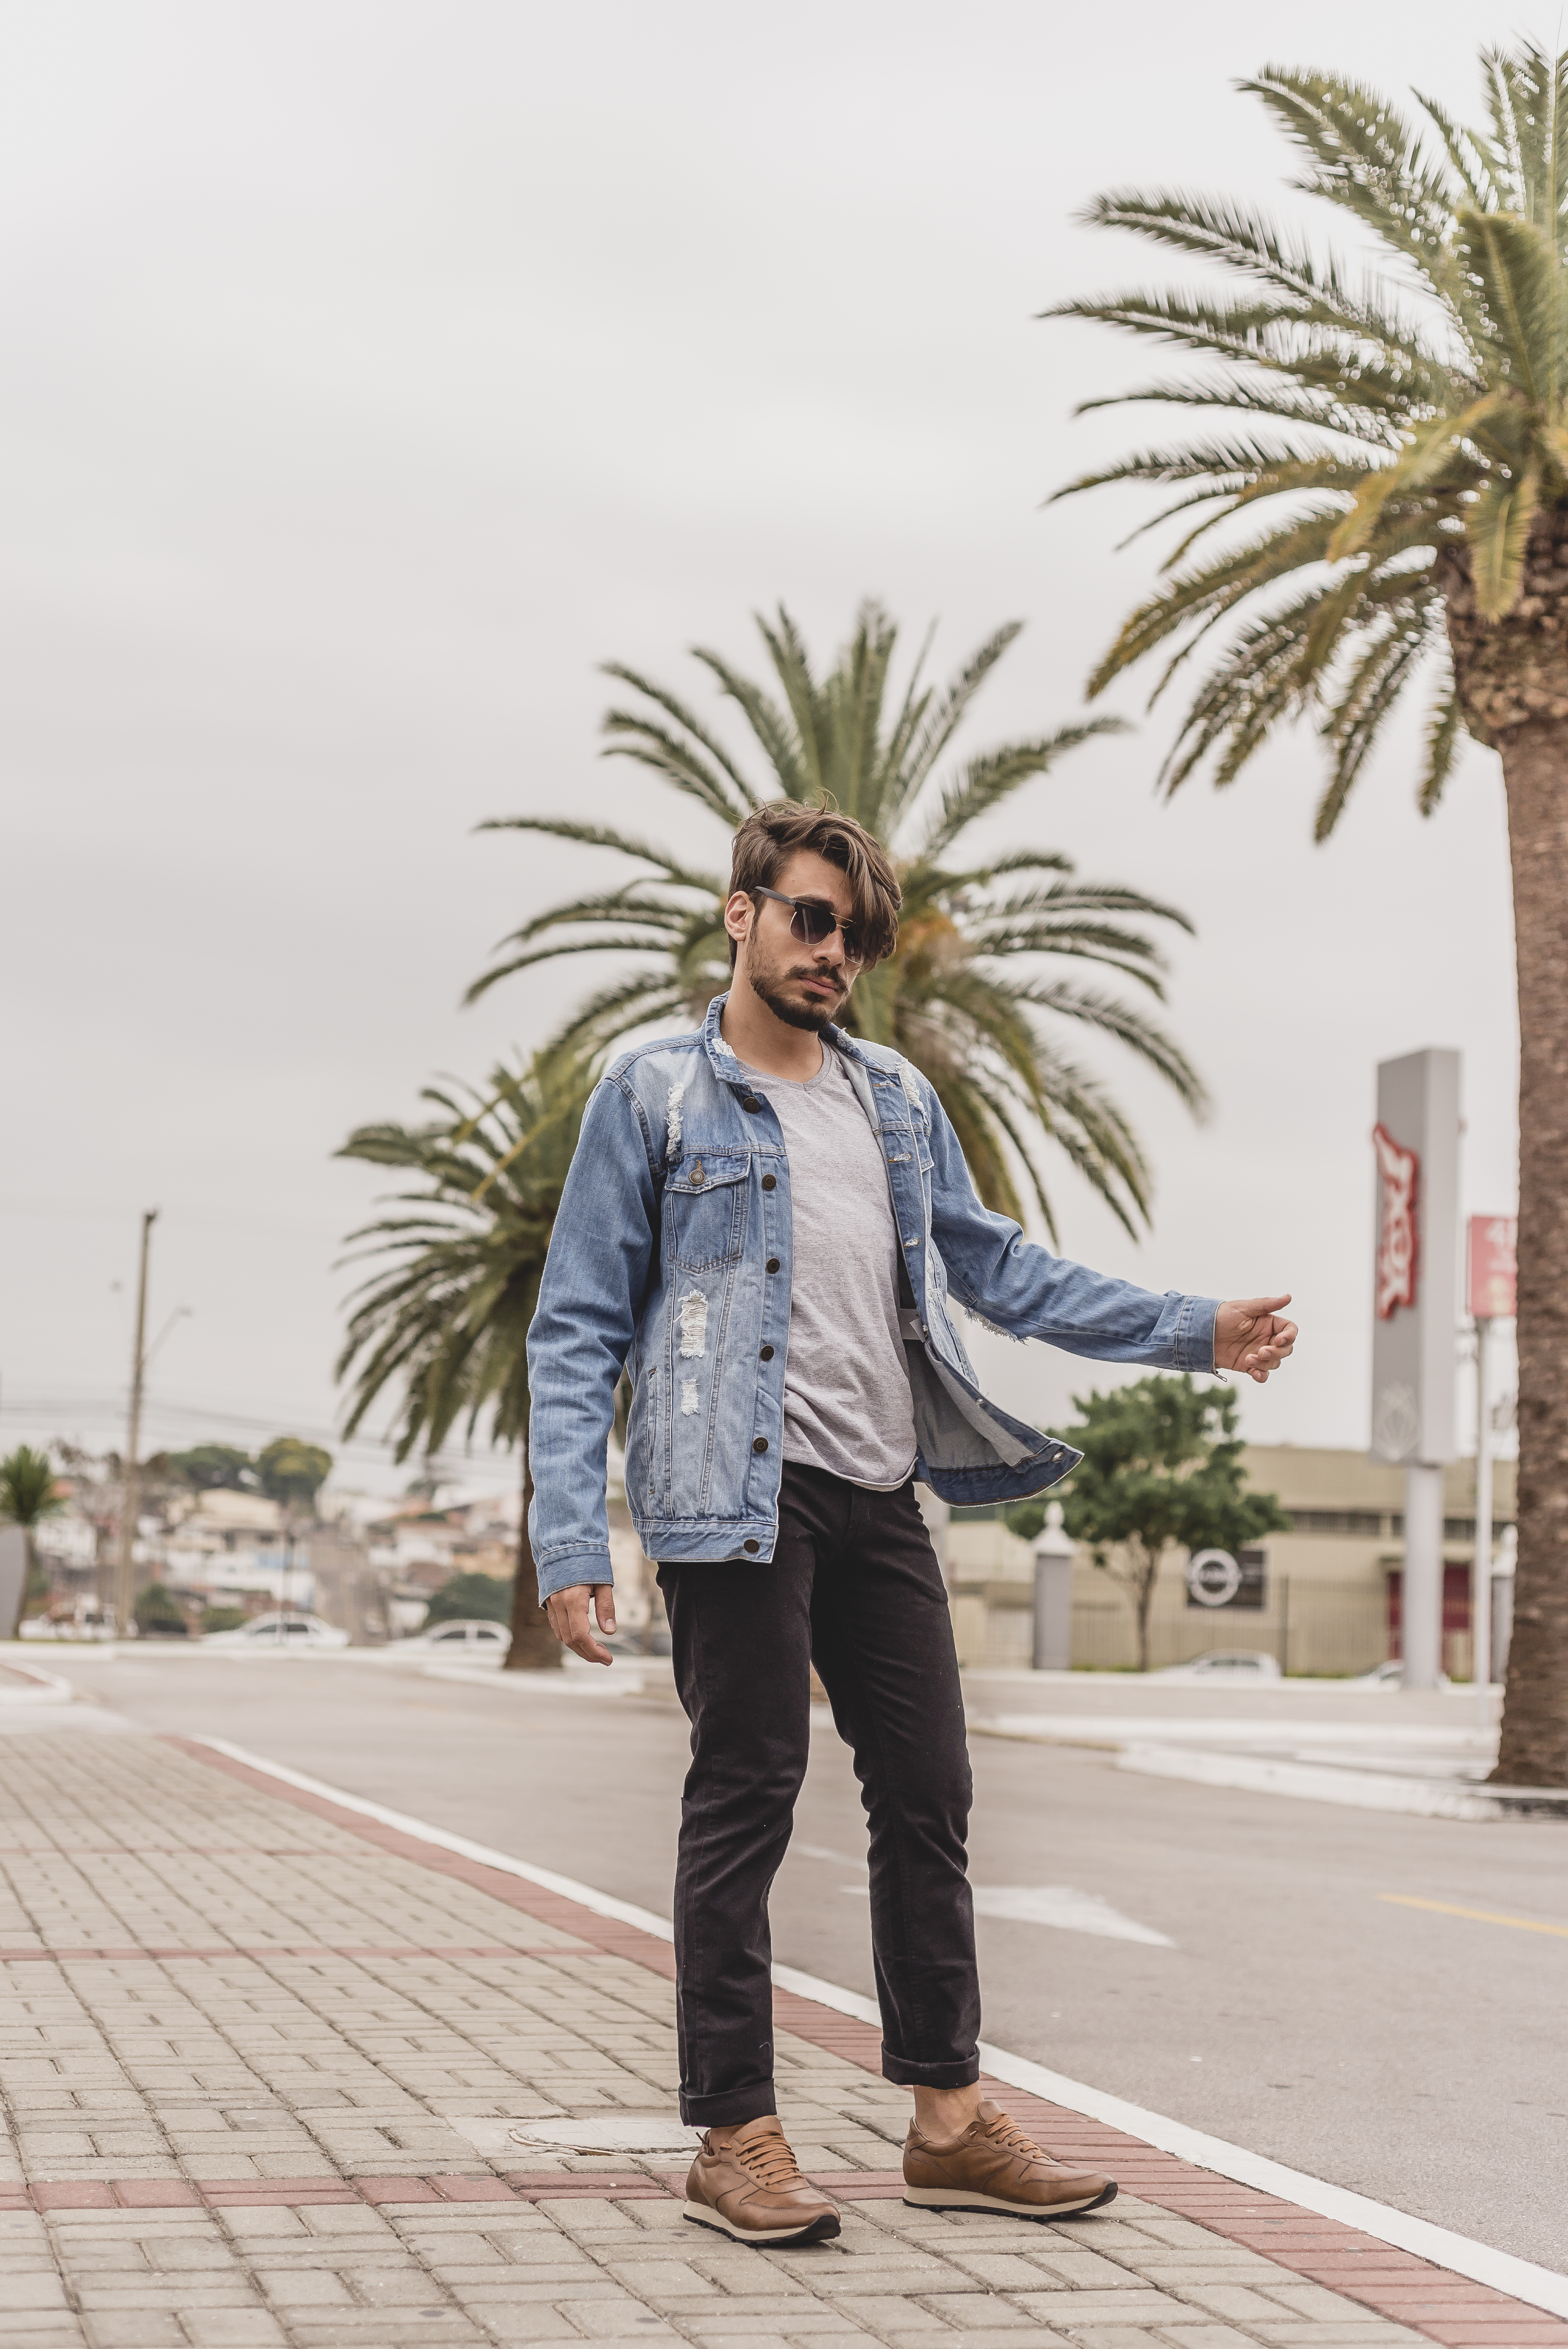 alex cursino, blogueiro de moda, ootd, look masculino 2018, roupa de homem, moda para homens, moda sem censura, youtuber de moda, dicas de moda masculina, dicas de estilo masculino, tng, tendencia masculina verão 2018,